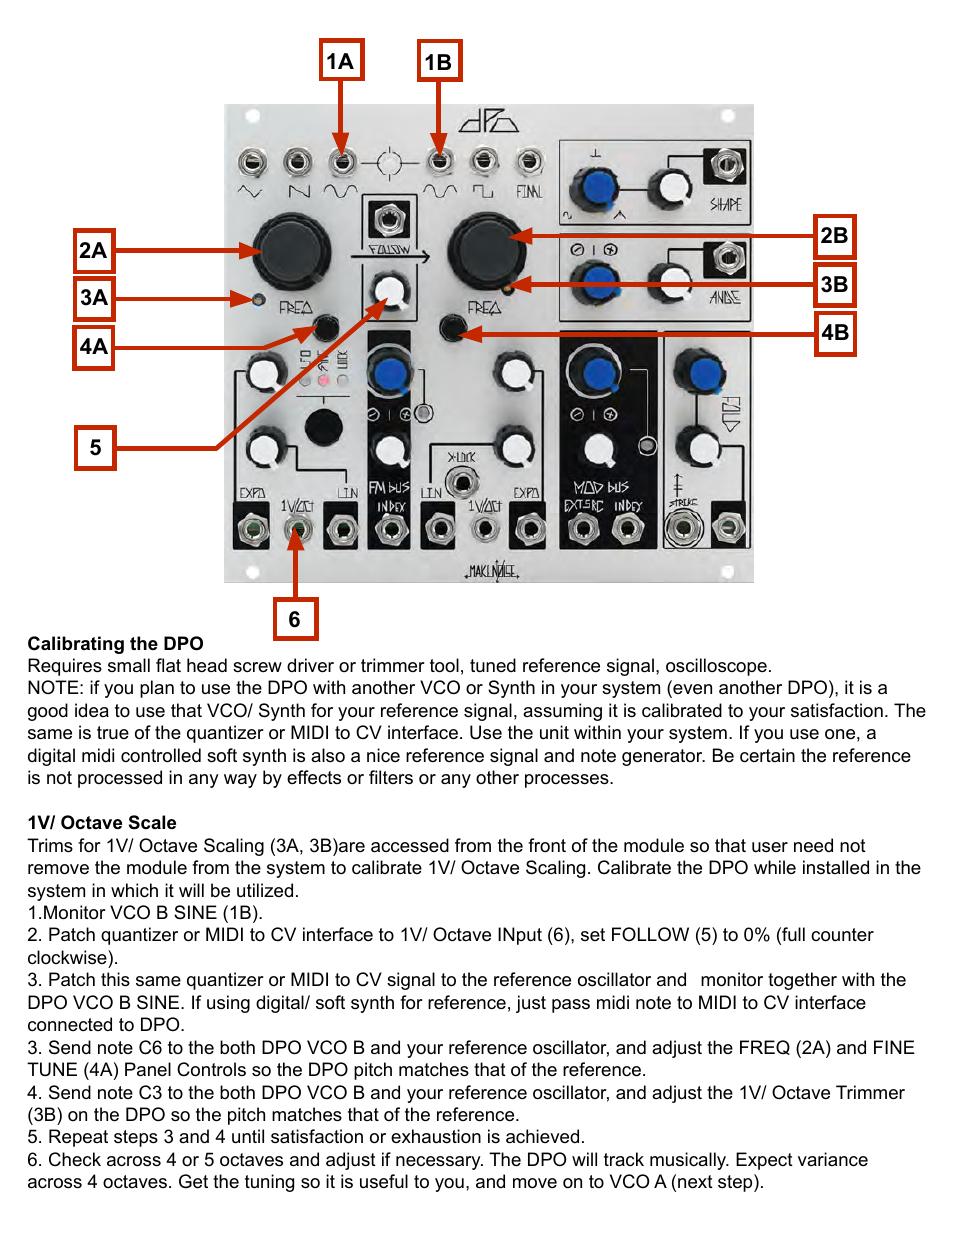 Make Noise Dpo User Manual